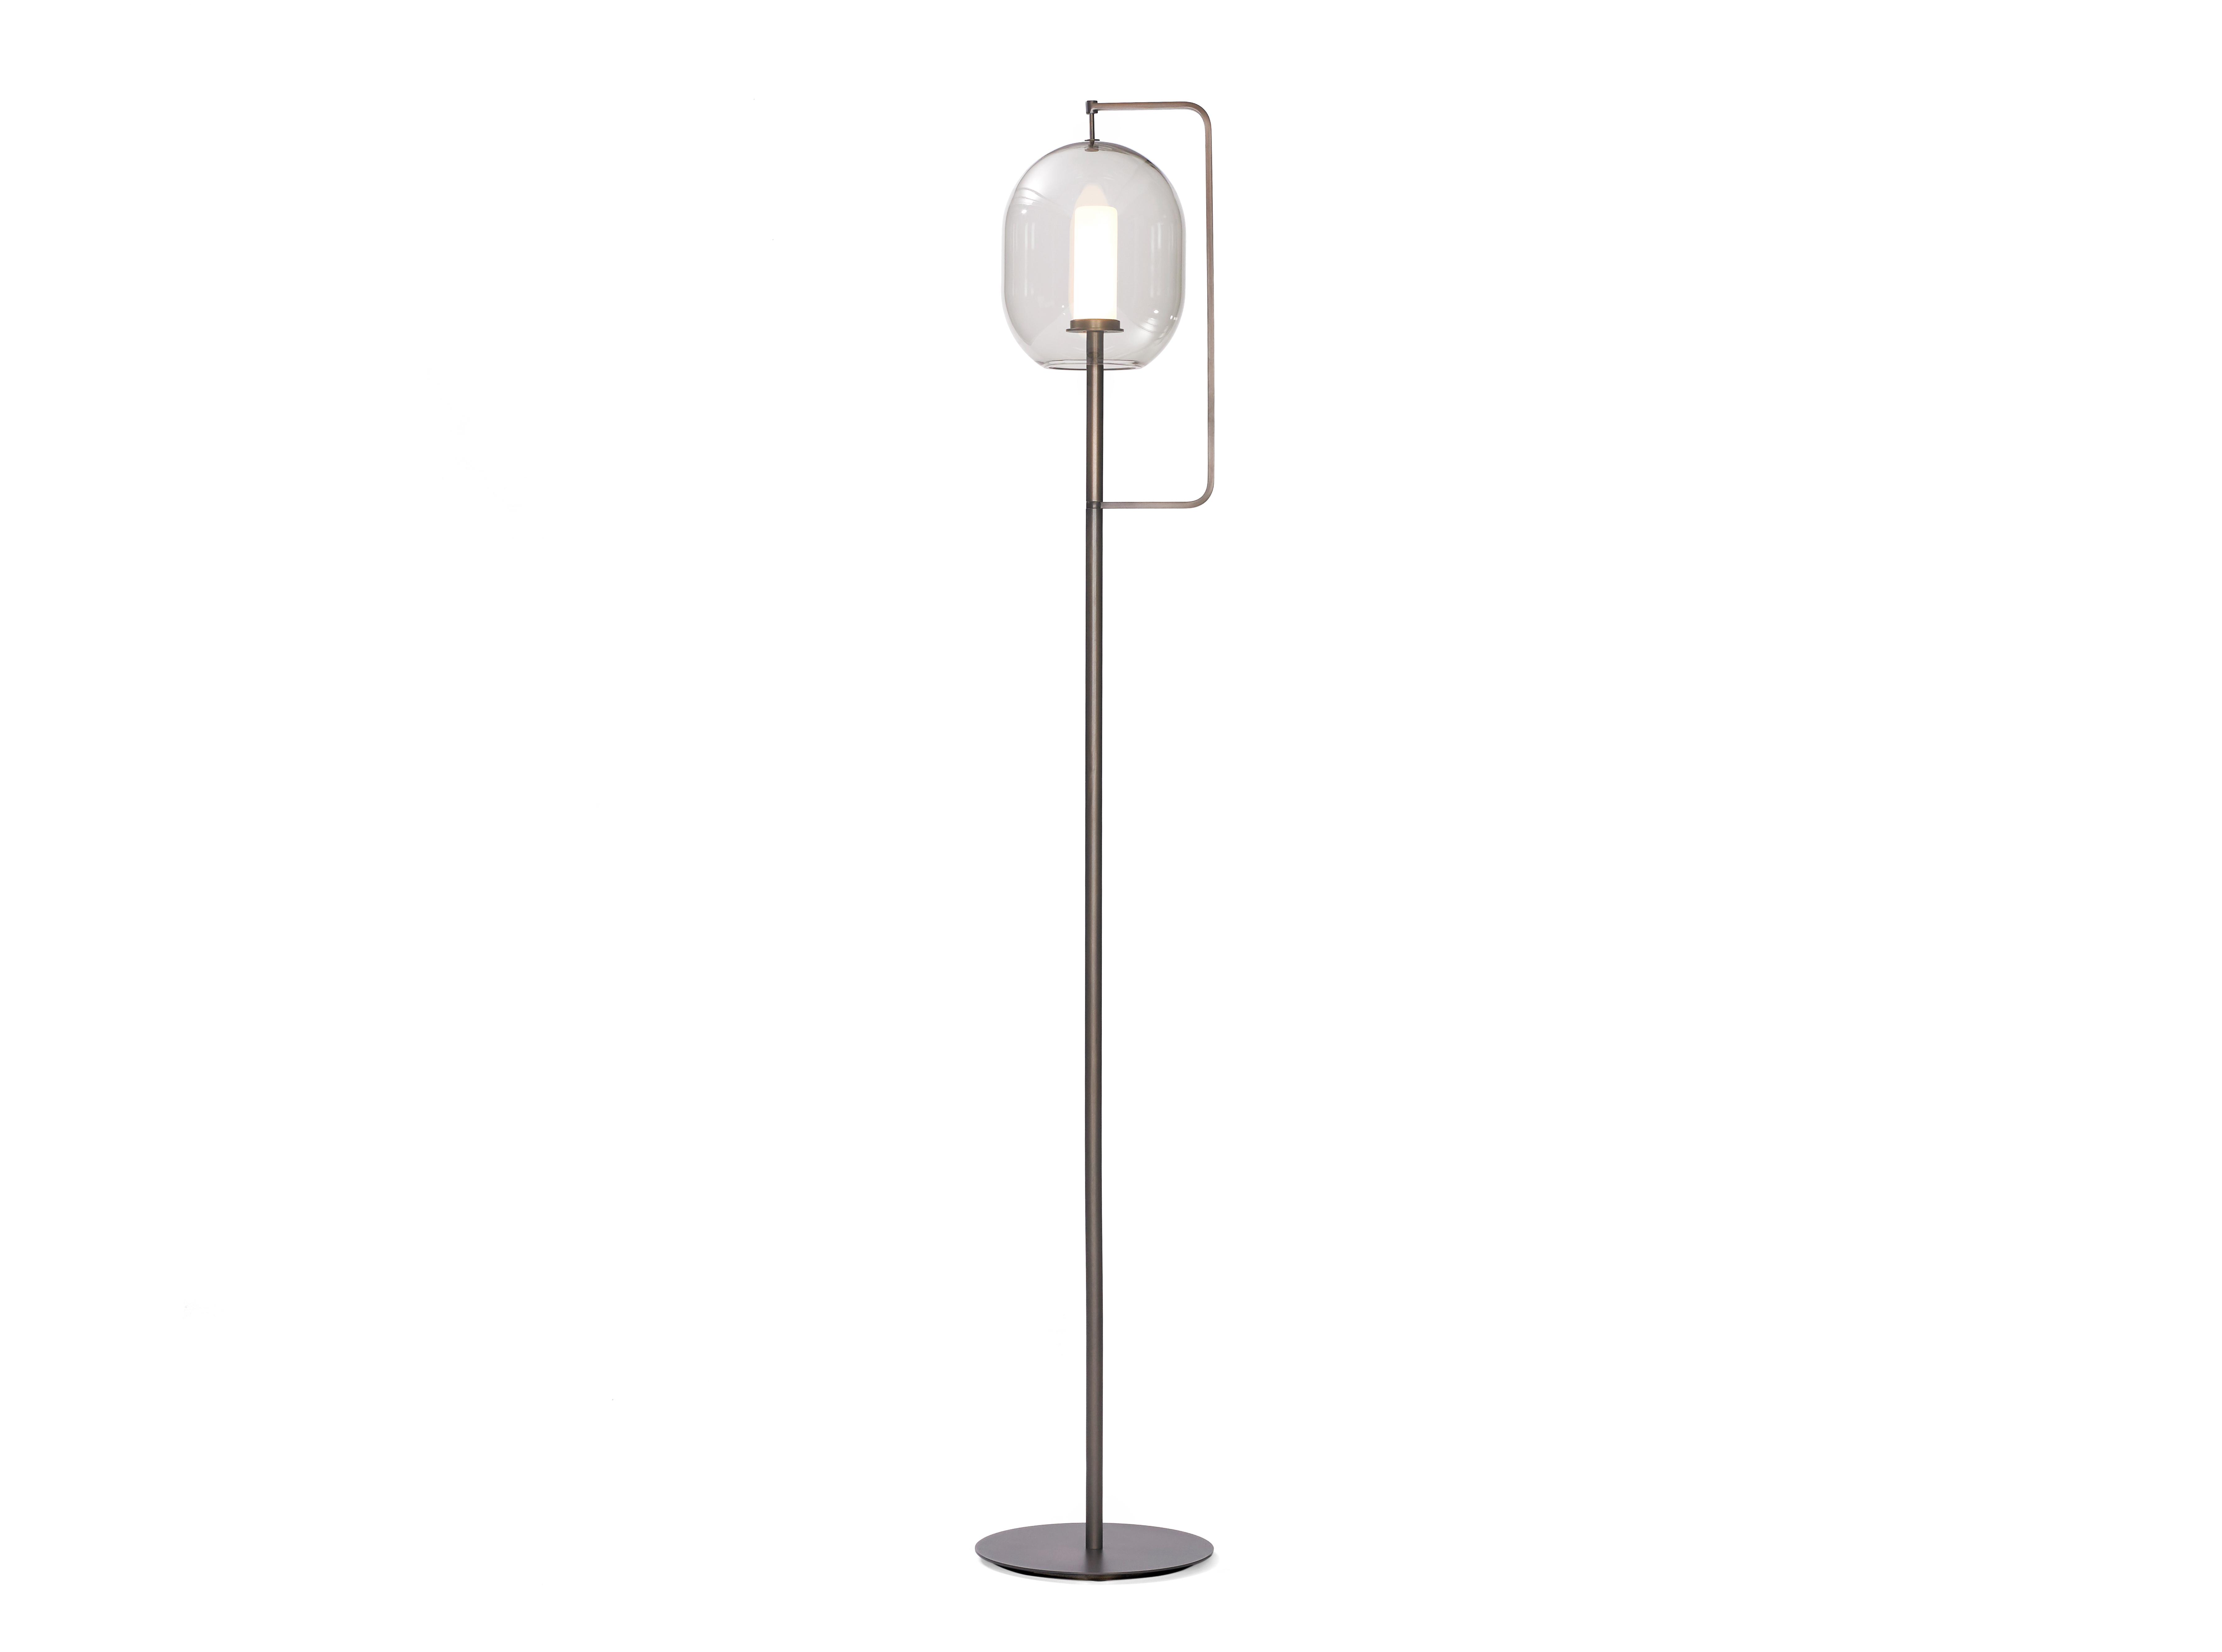 Lantern light floor lamp by classicon stylepark lantern light floor lamp aloadofball Image collections